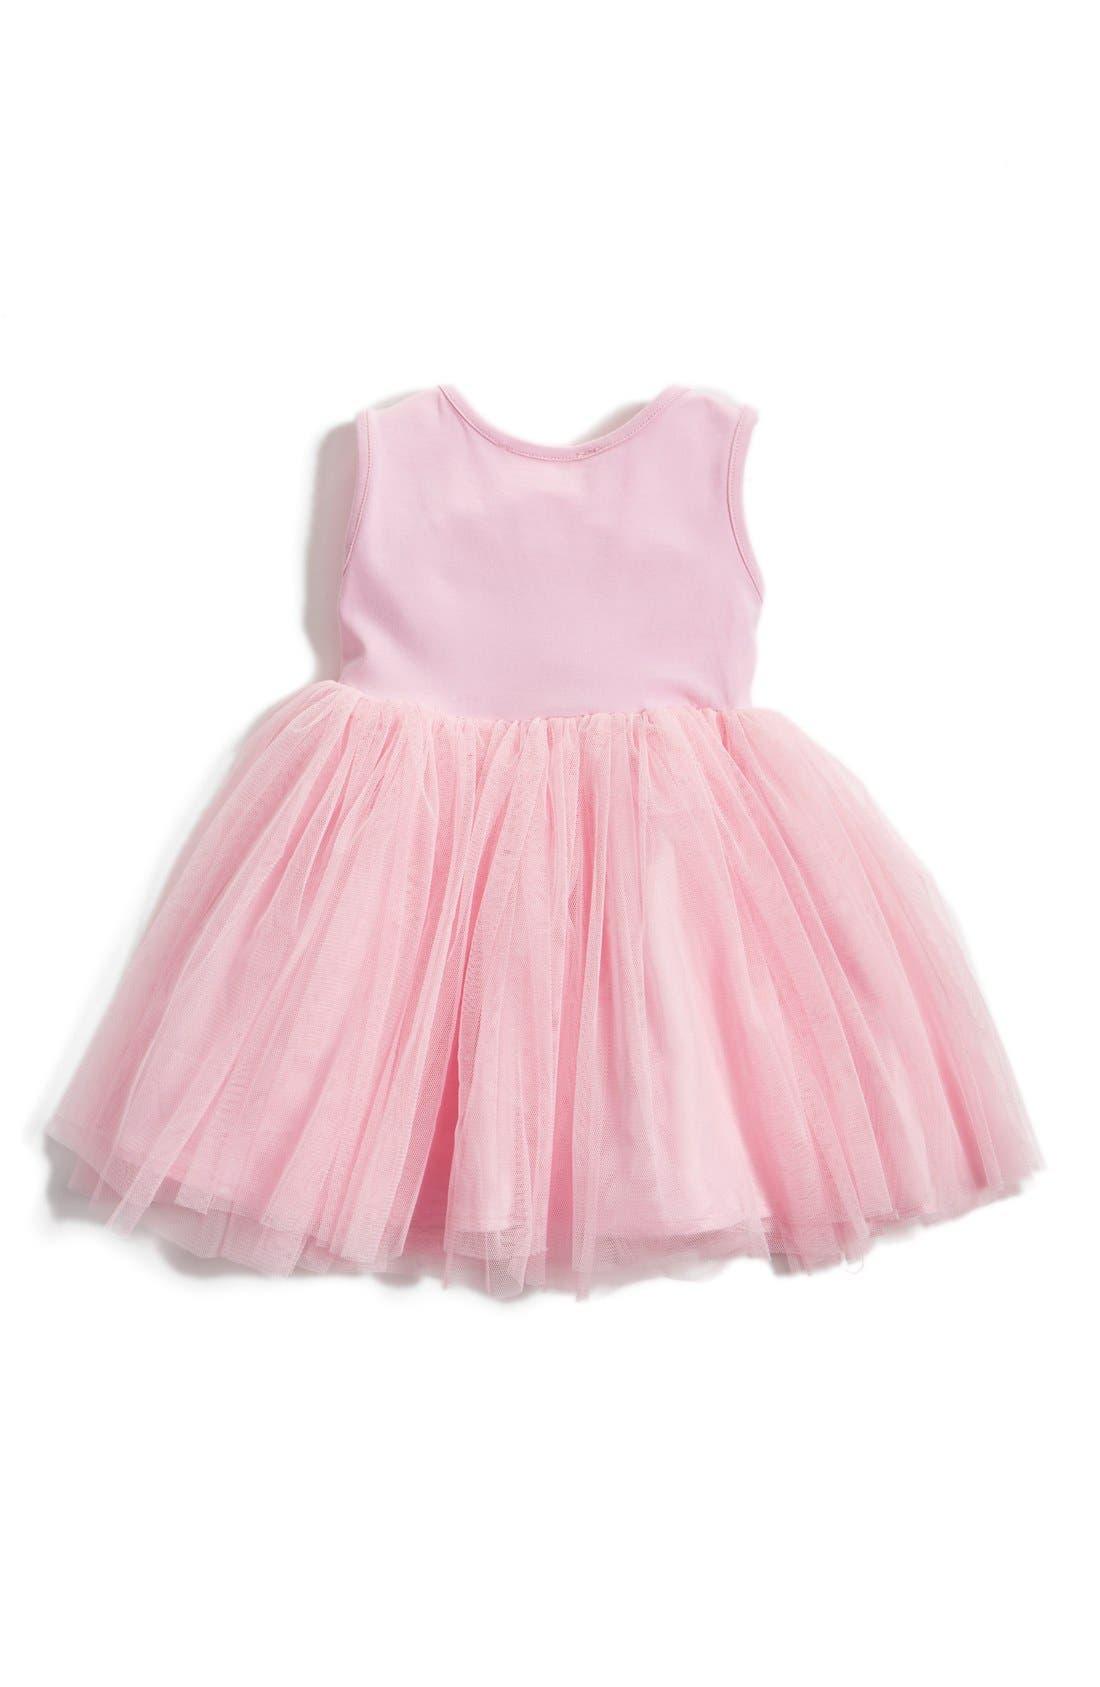 Sequin Flower Tulle Dress,                             Alternate thumbnail 2, color,                             Pink